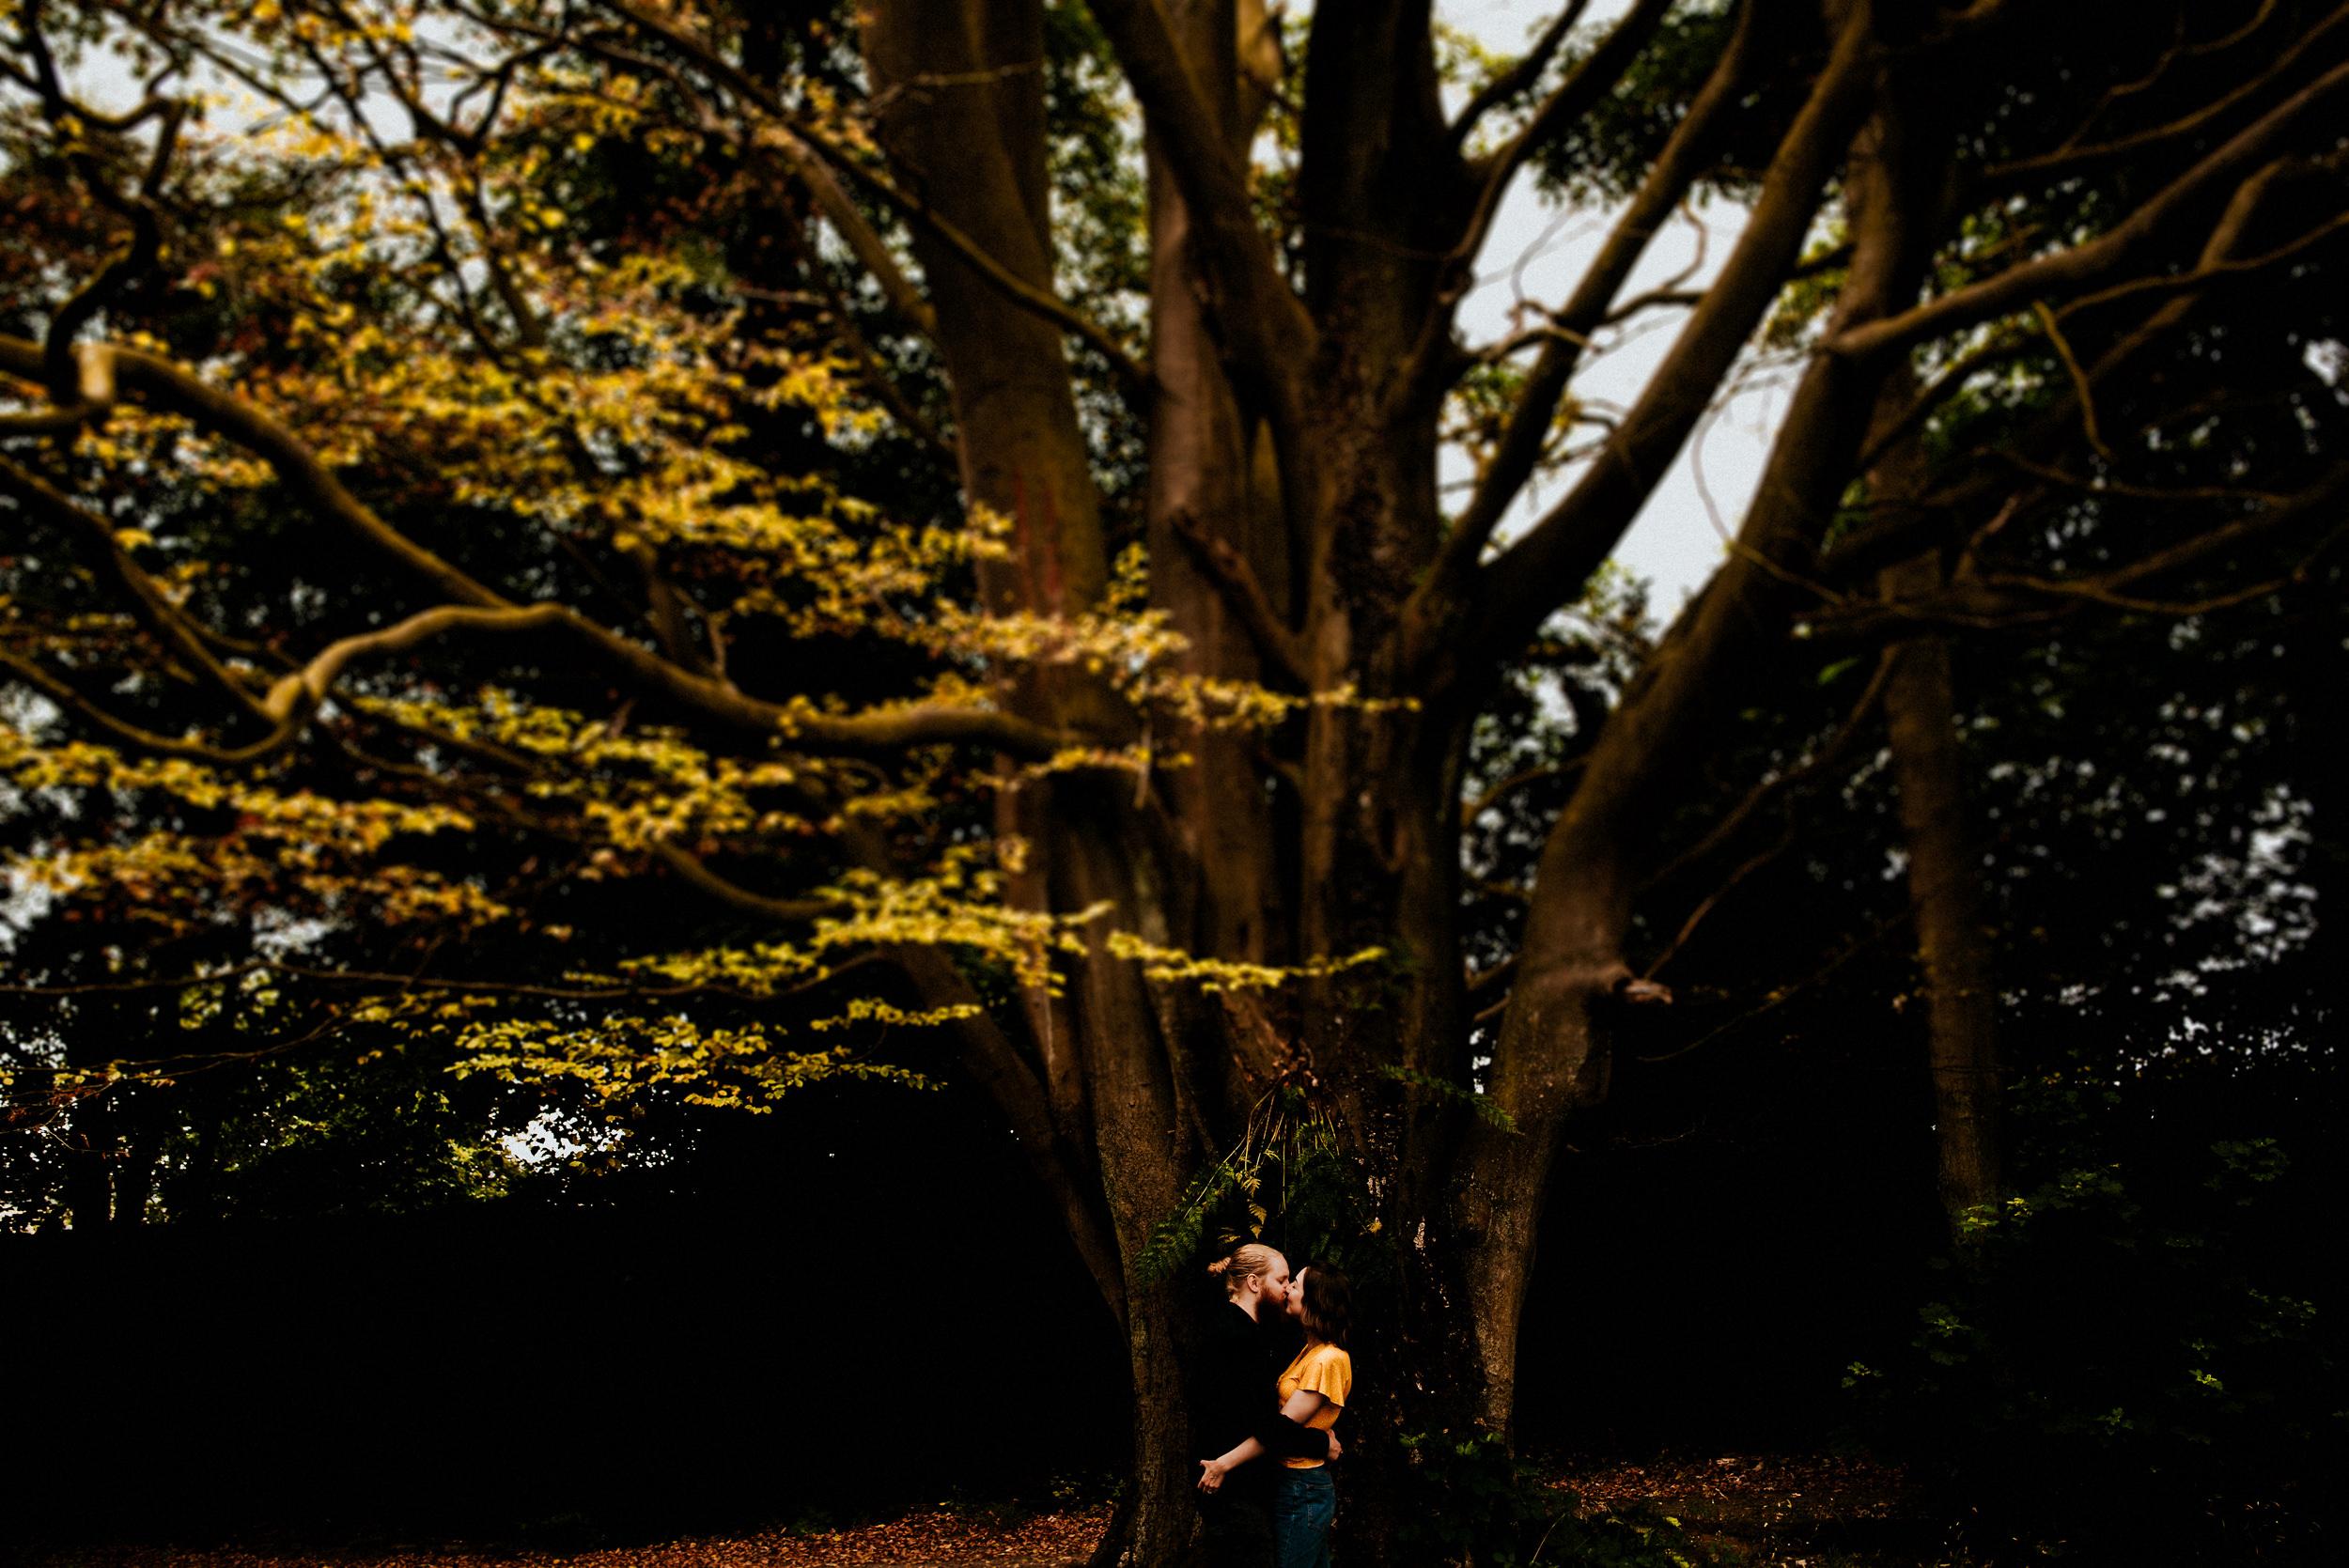 St-Ives-Park-Bingley-Engagement-Shoot-Alternative-Portraits-18.jpg